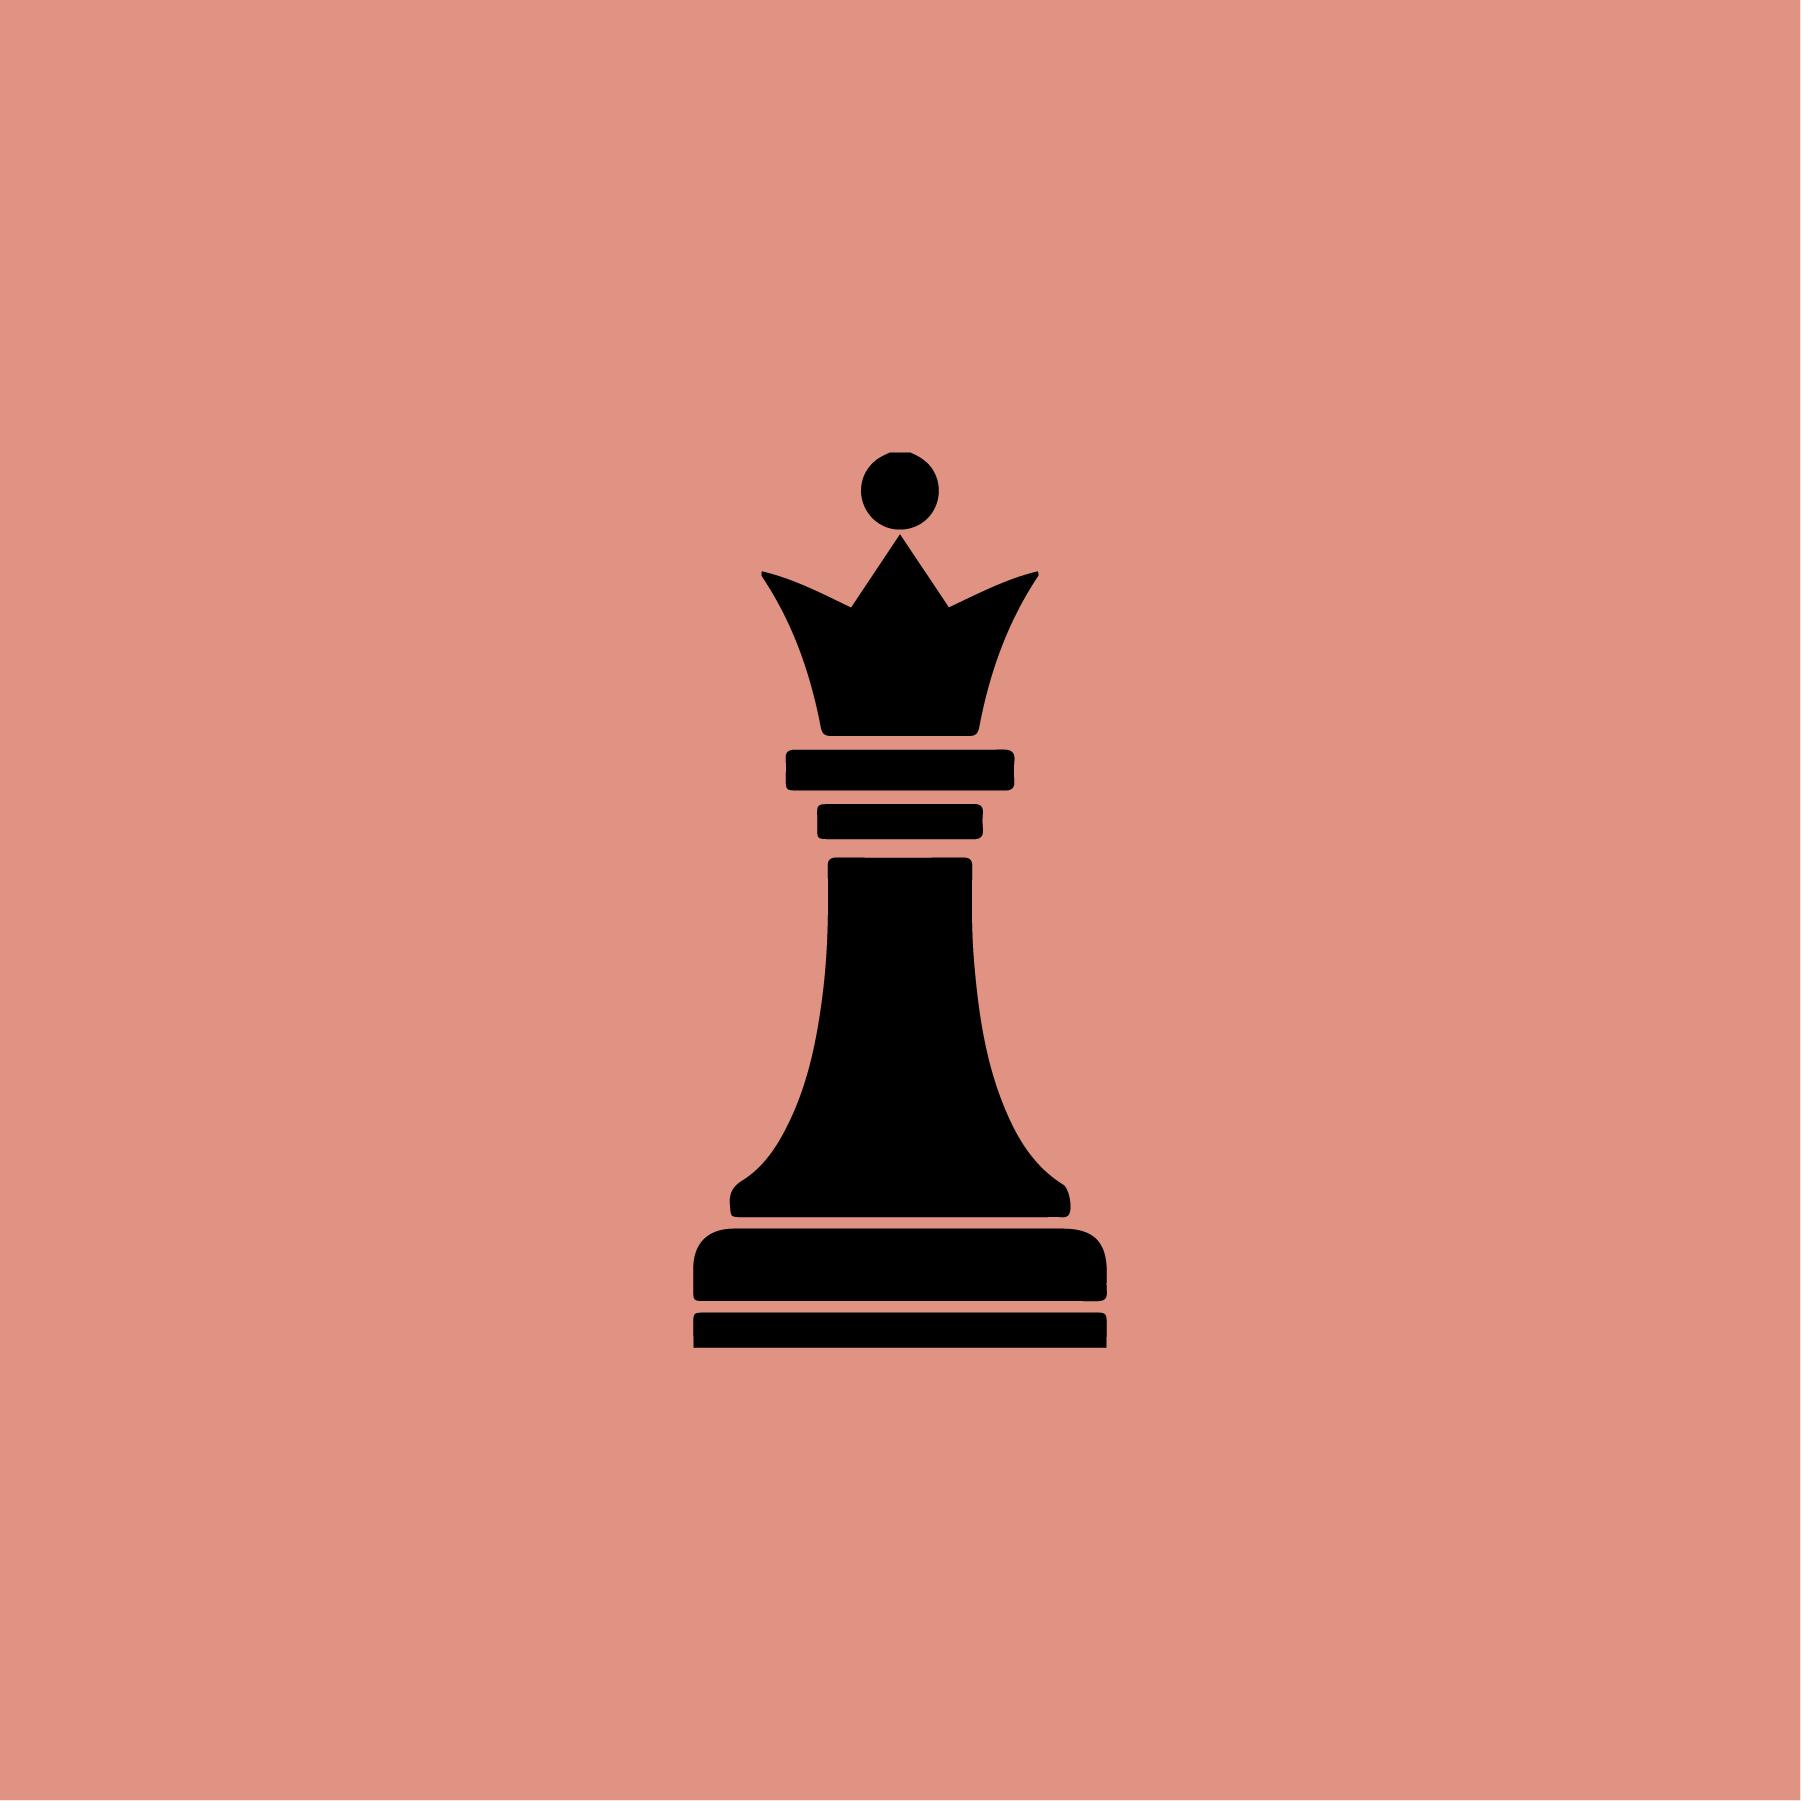 Chess Piece Logo Icon Creative Branding Design Creative Branding Branding Design Studio